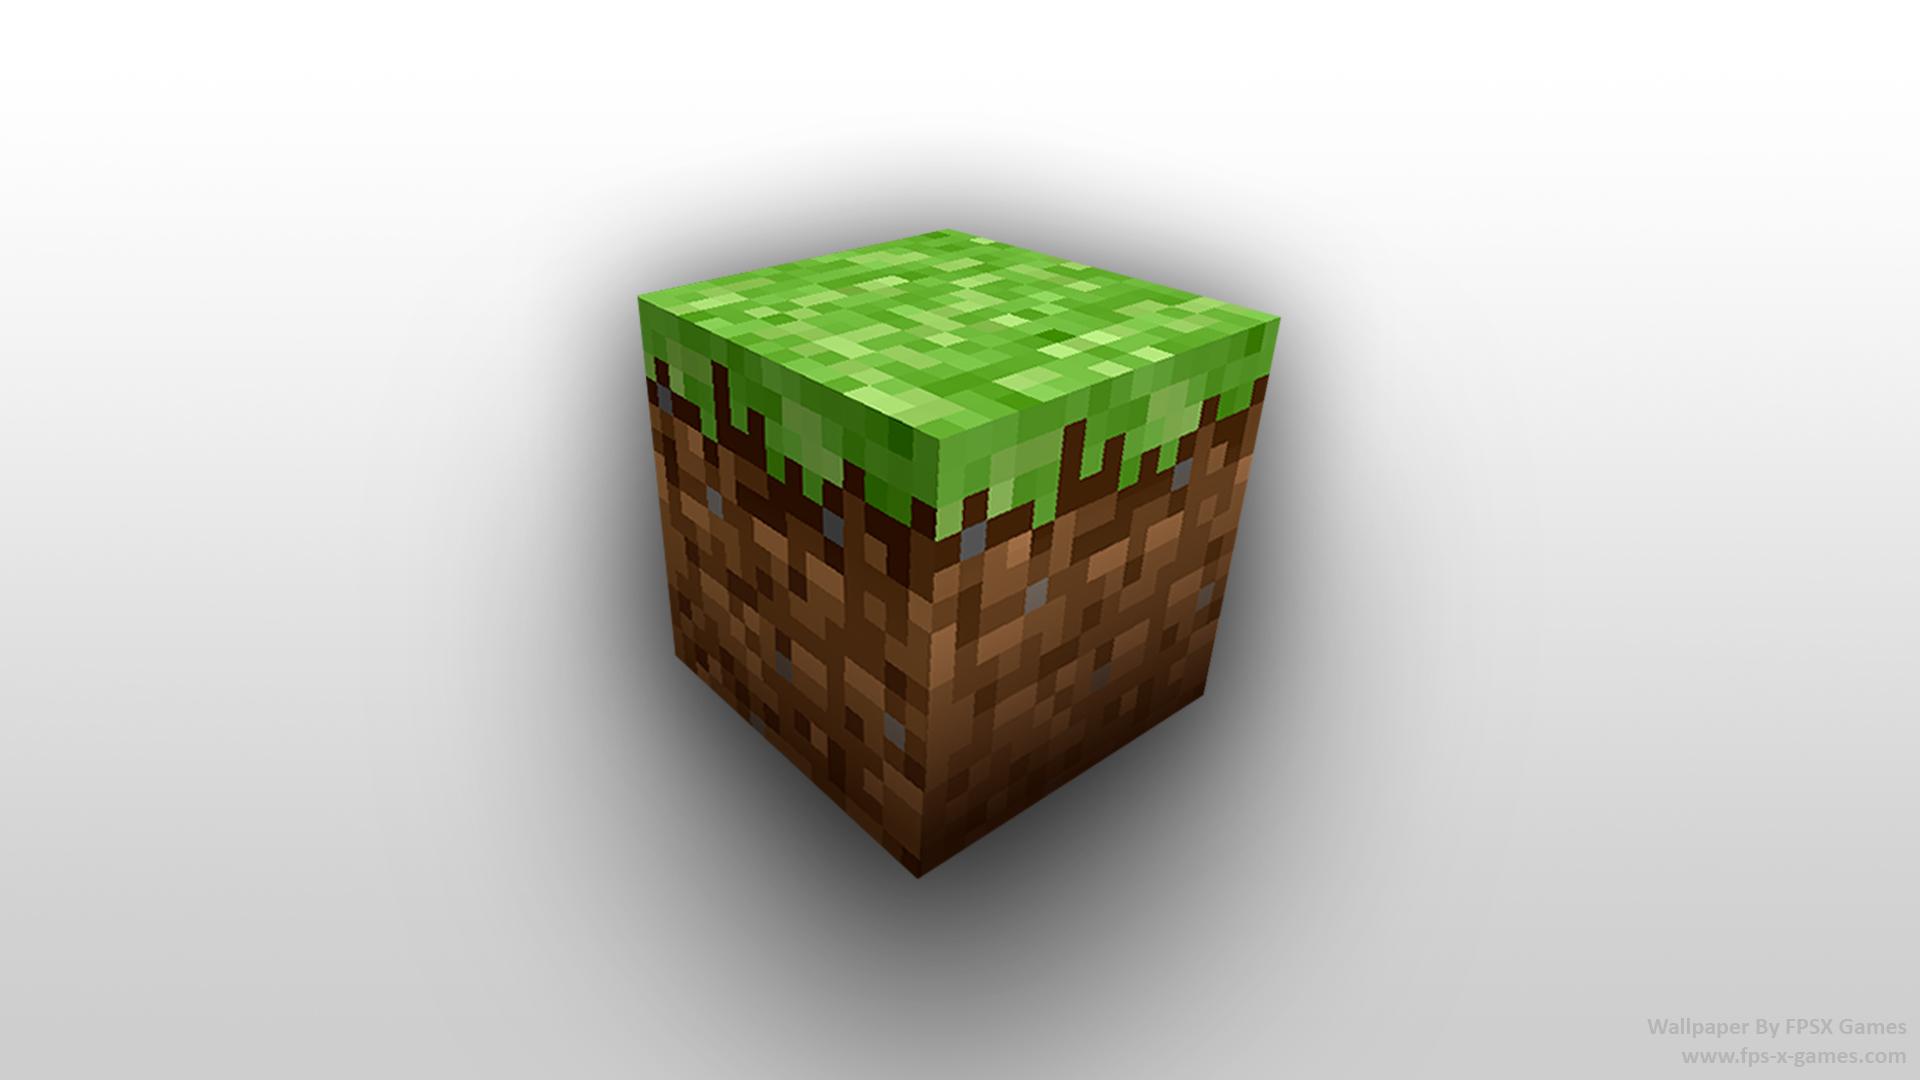 Minecraft Dirt Block desktop wallpaper by fpsxgames 1920x1080